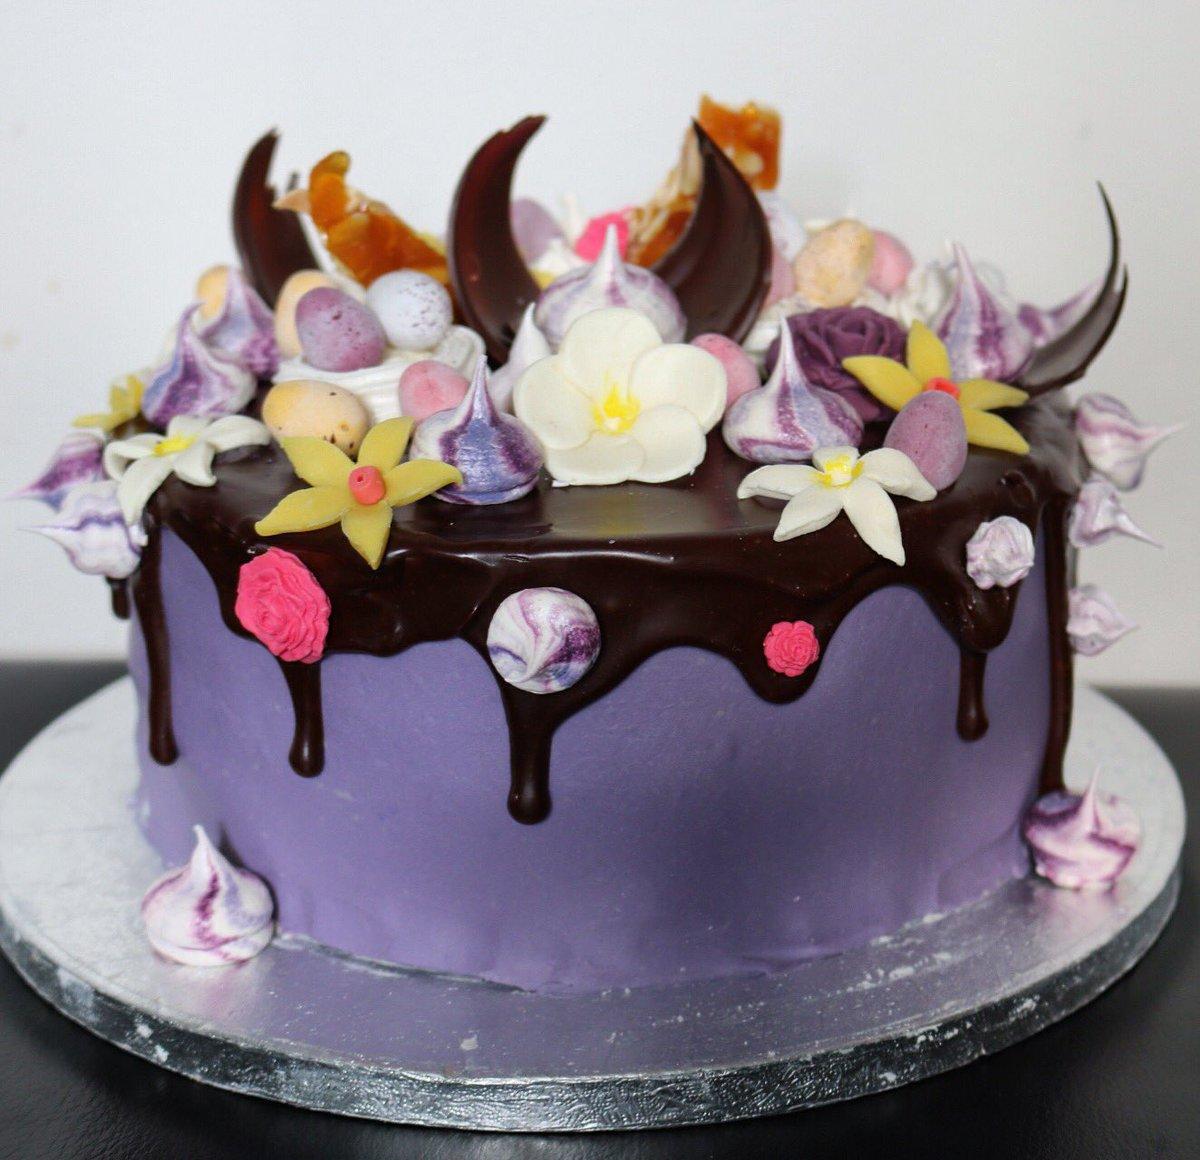 Eva The Cake Diva On Twitter Happy Birthday To Abina My First